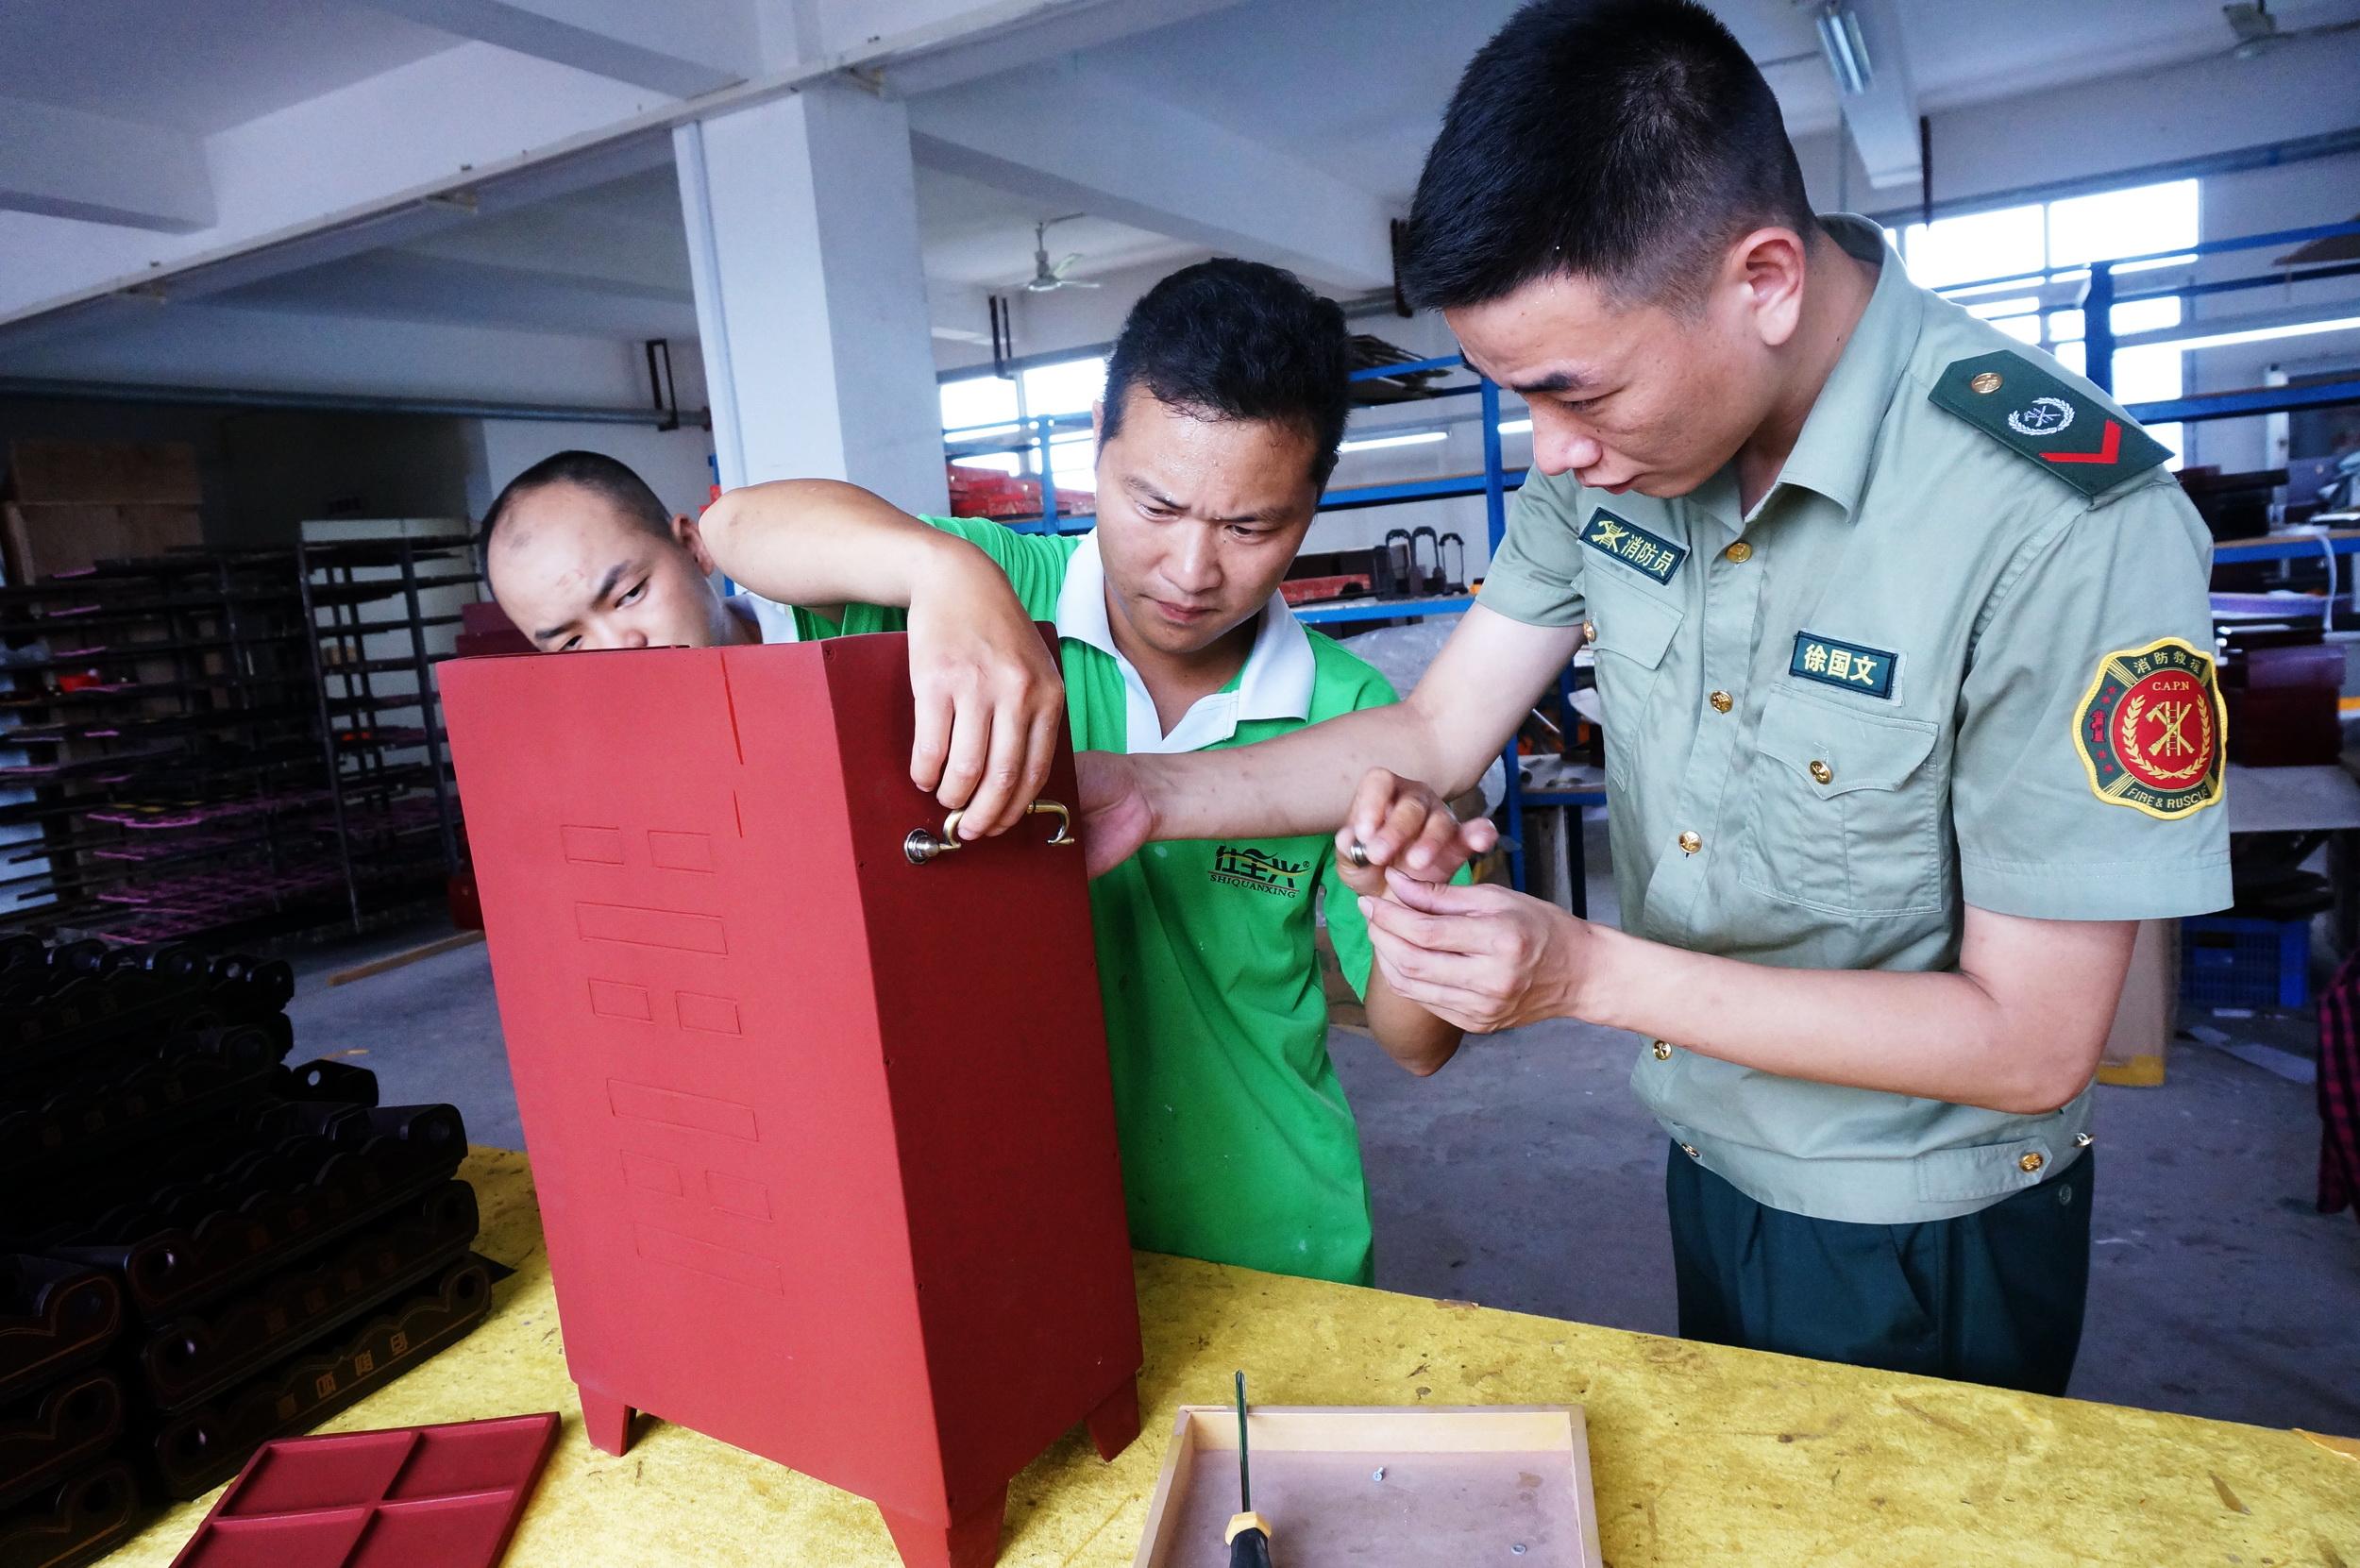 DSC04422图为生产工人正在组装防腐玻璃钢灭火器箱时的情景.jpg